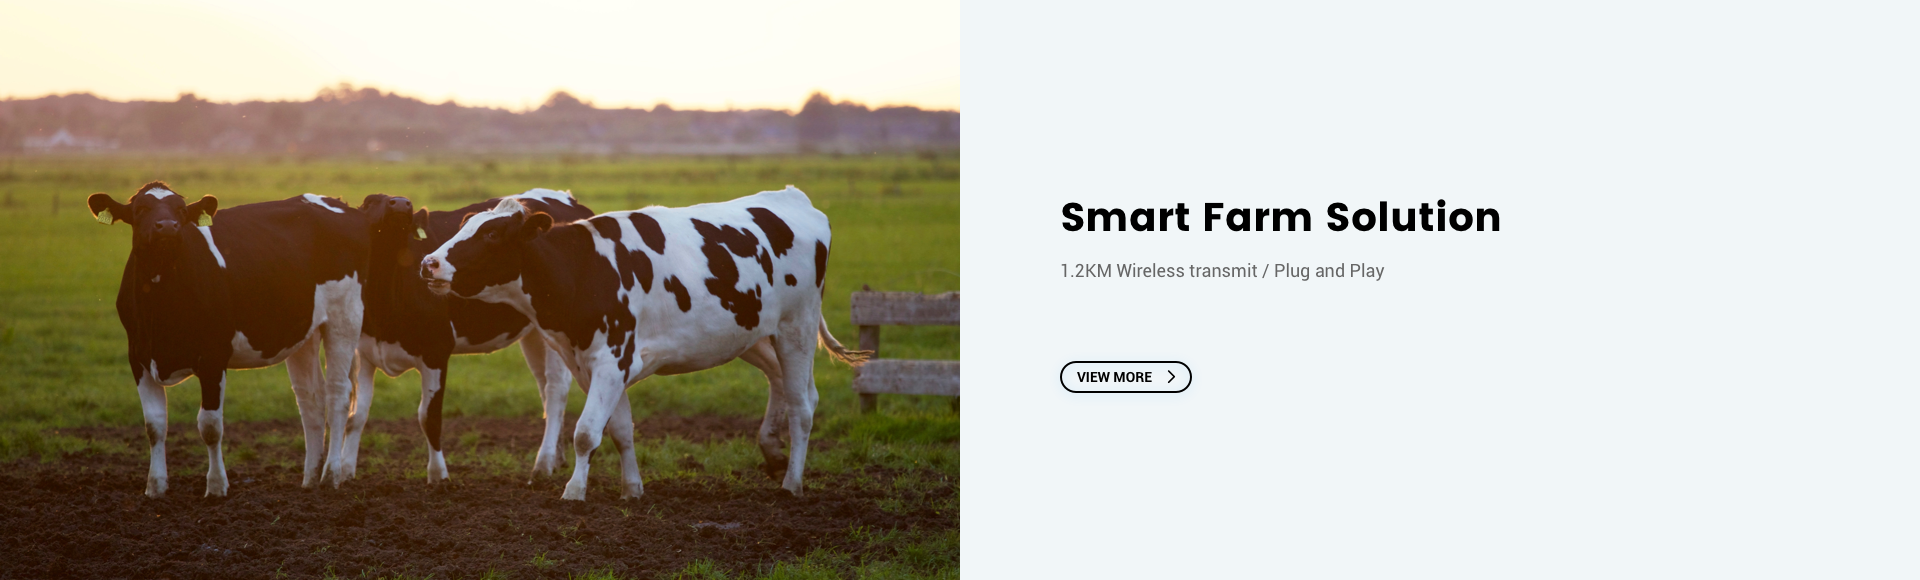 Smart Farm Solution